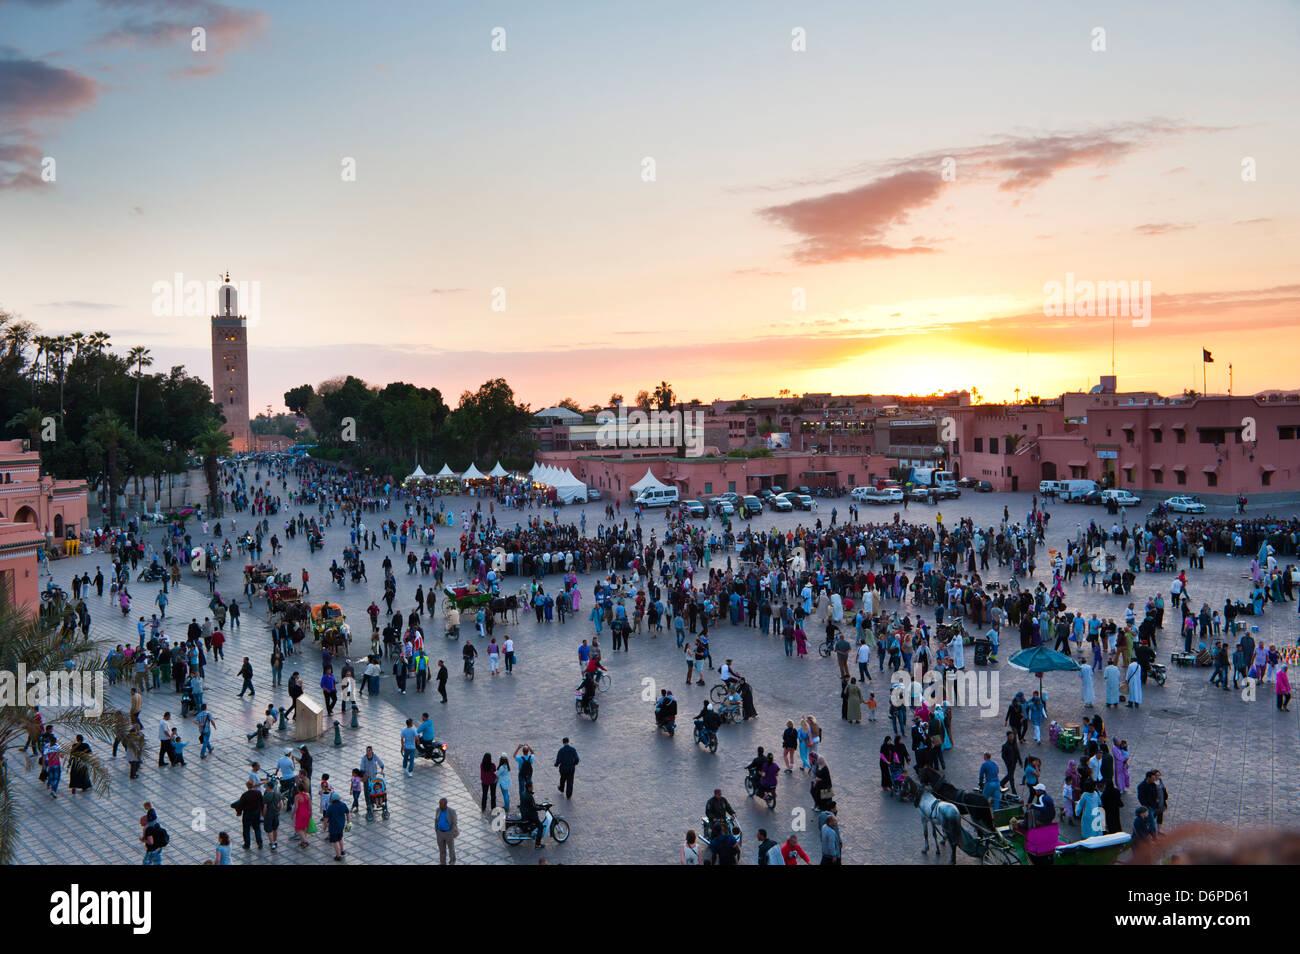 Piazza Djemaa El Fna e Moschea di Koutoubia al tramonto, Marrakech, Marocco, Africa Settentrionale, Africa Immagini Stock